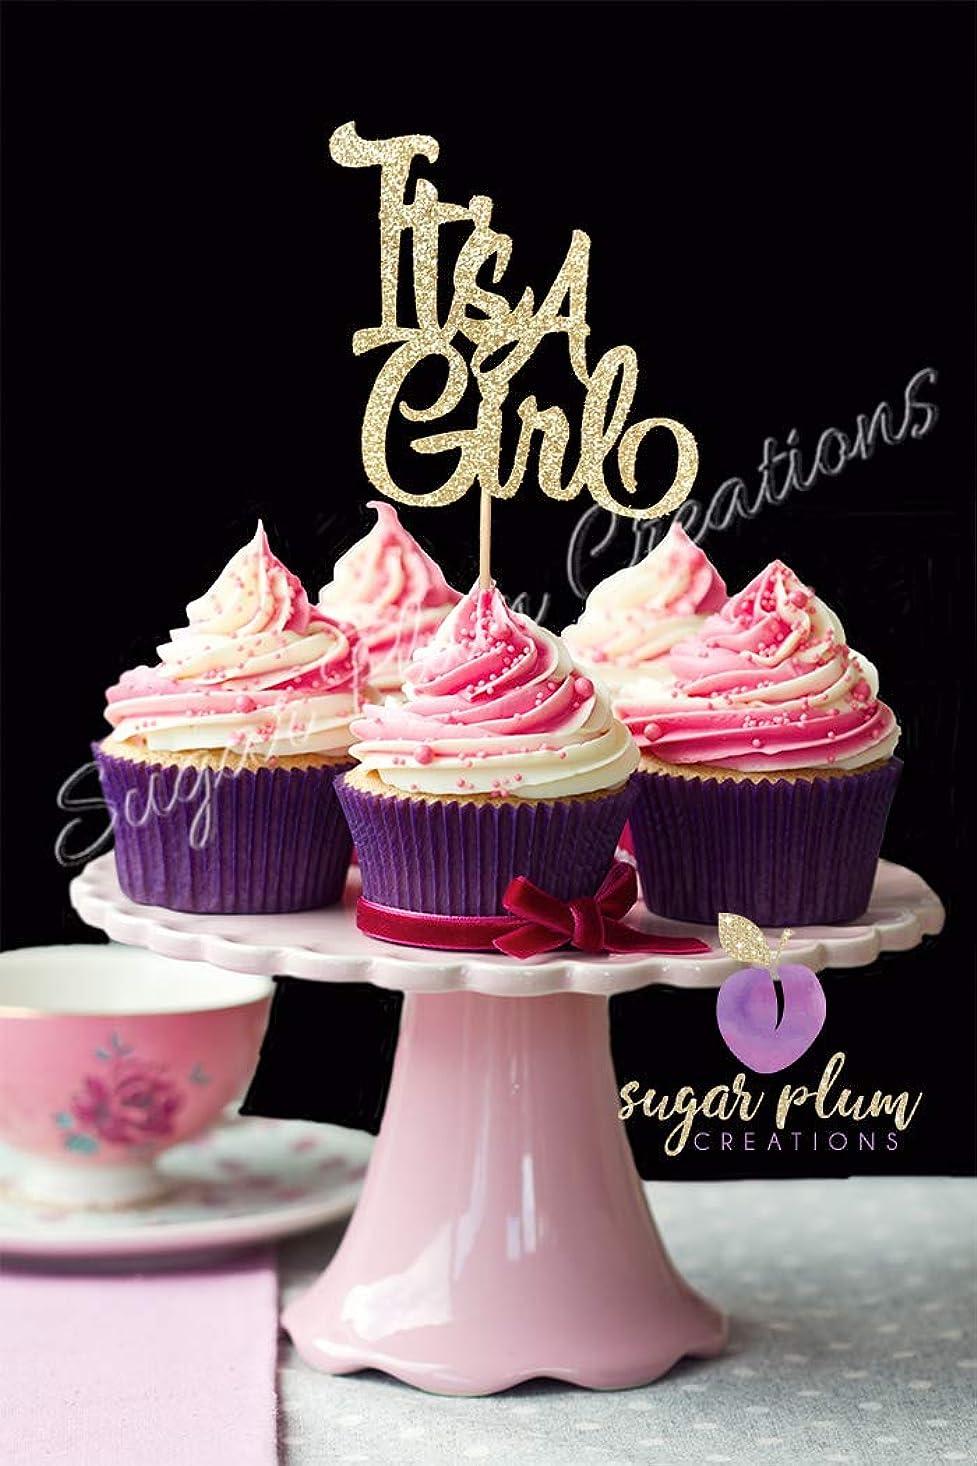 Sugar Plum Creations Set of 12 Baby Girl Cupcake Topper bshinfcpduejge